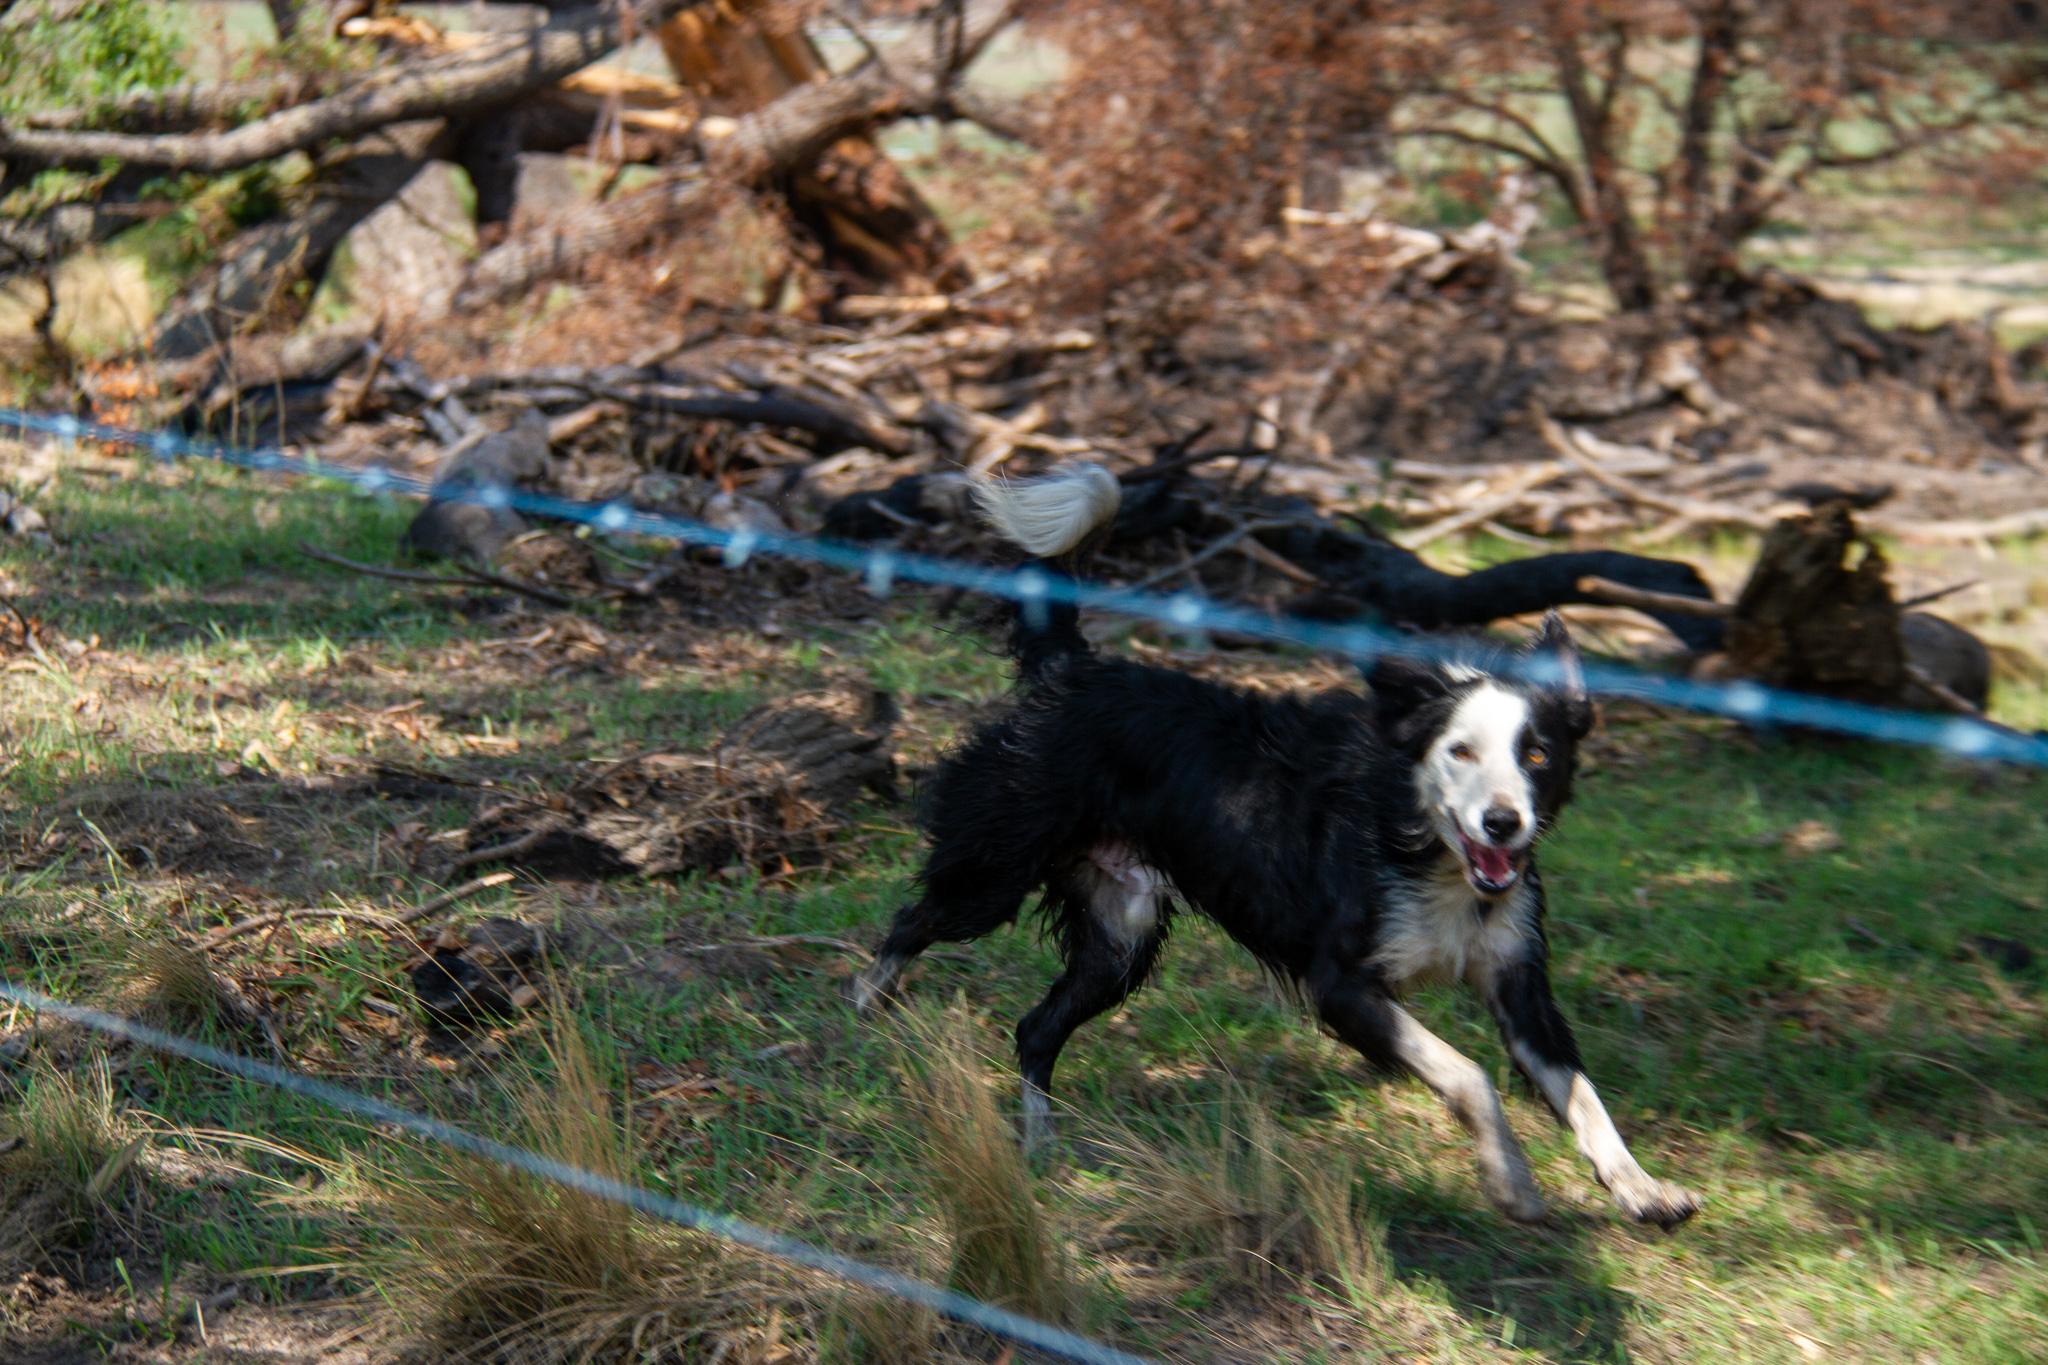 Dog BlazeAid Braidwood New South Wales Australia